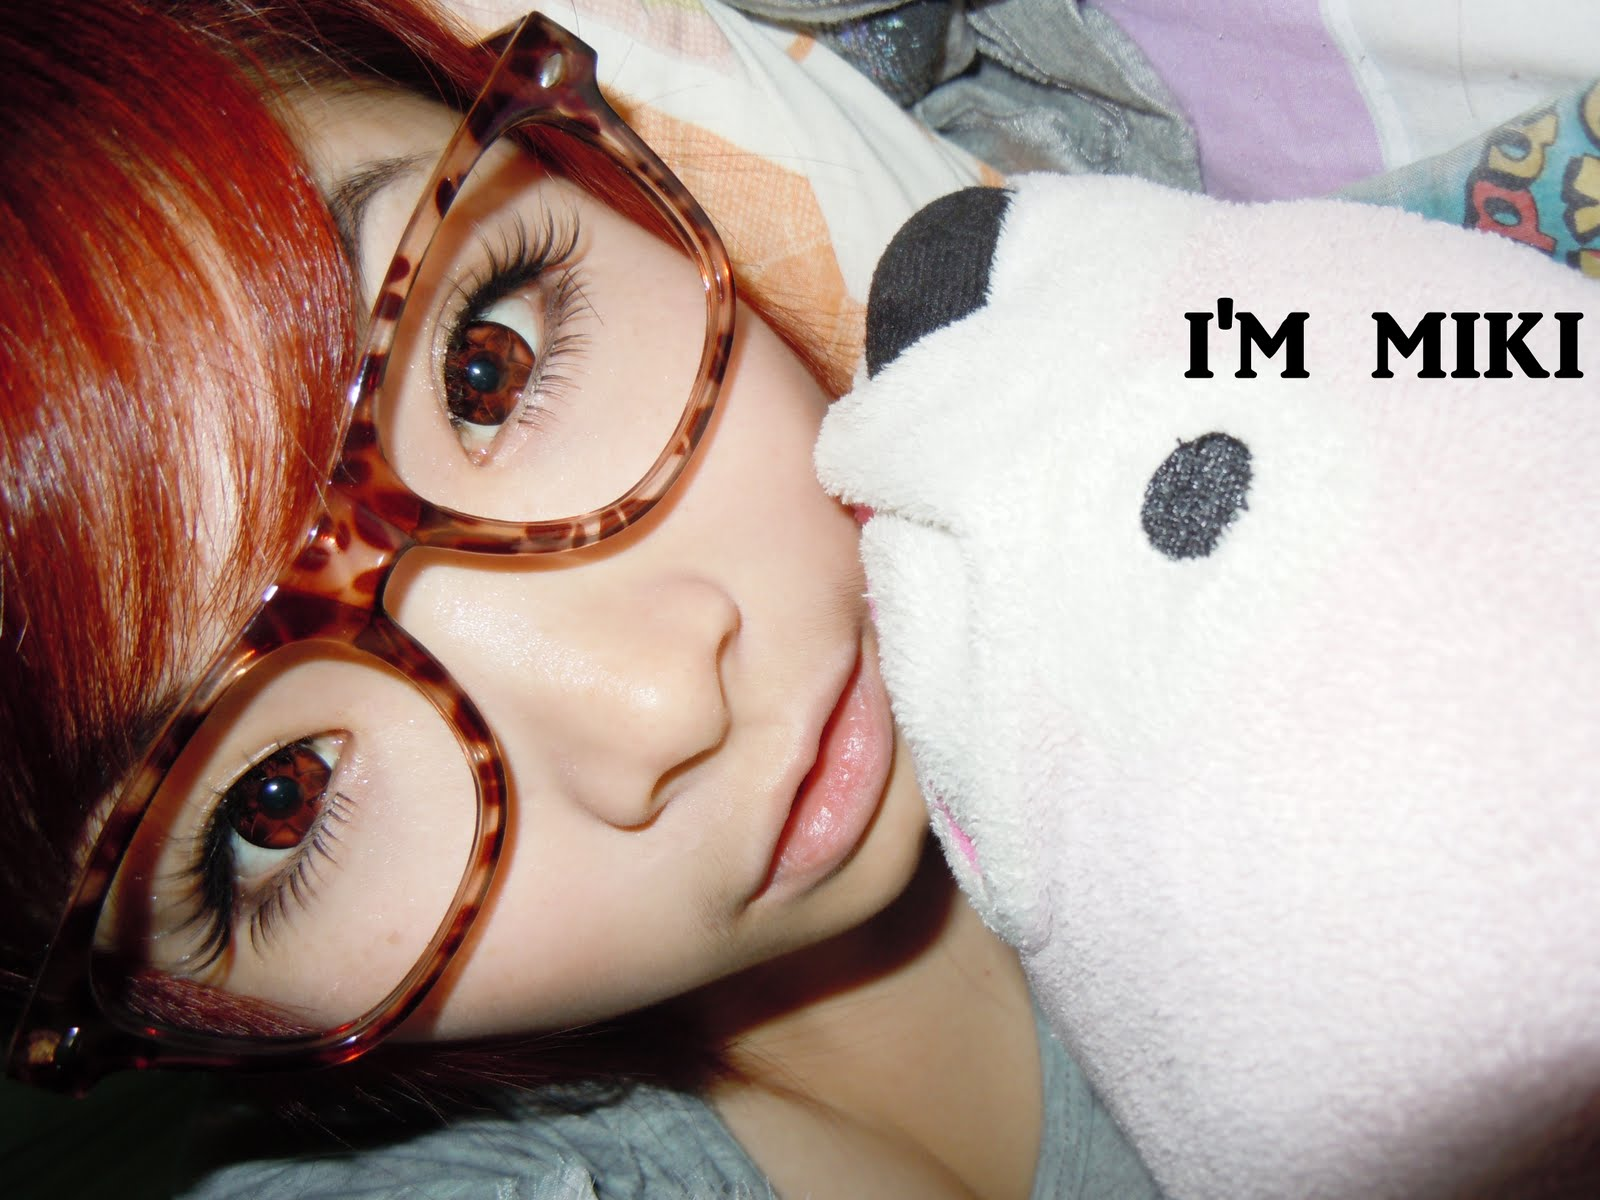 ♥ M.I.K.I ♥